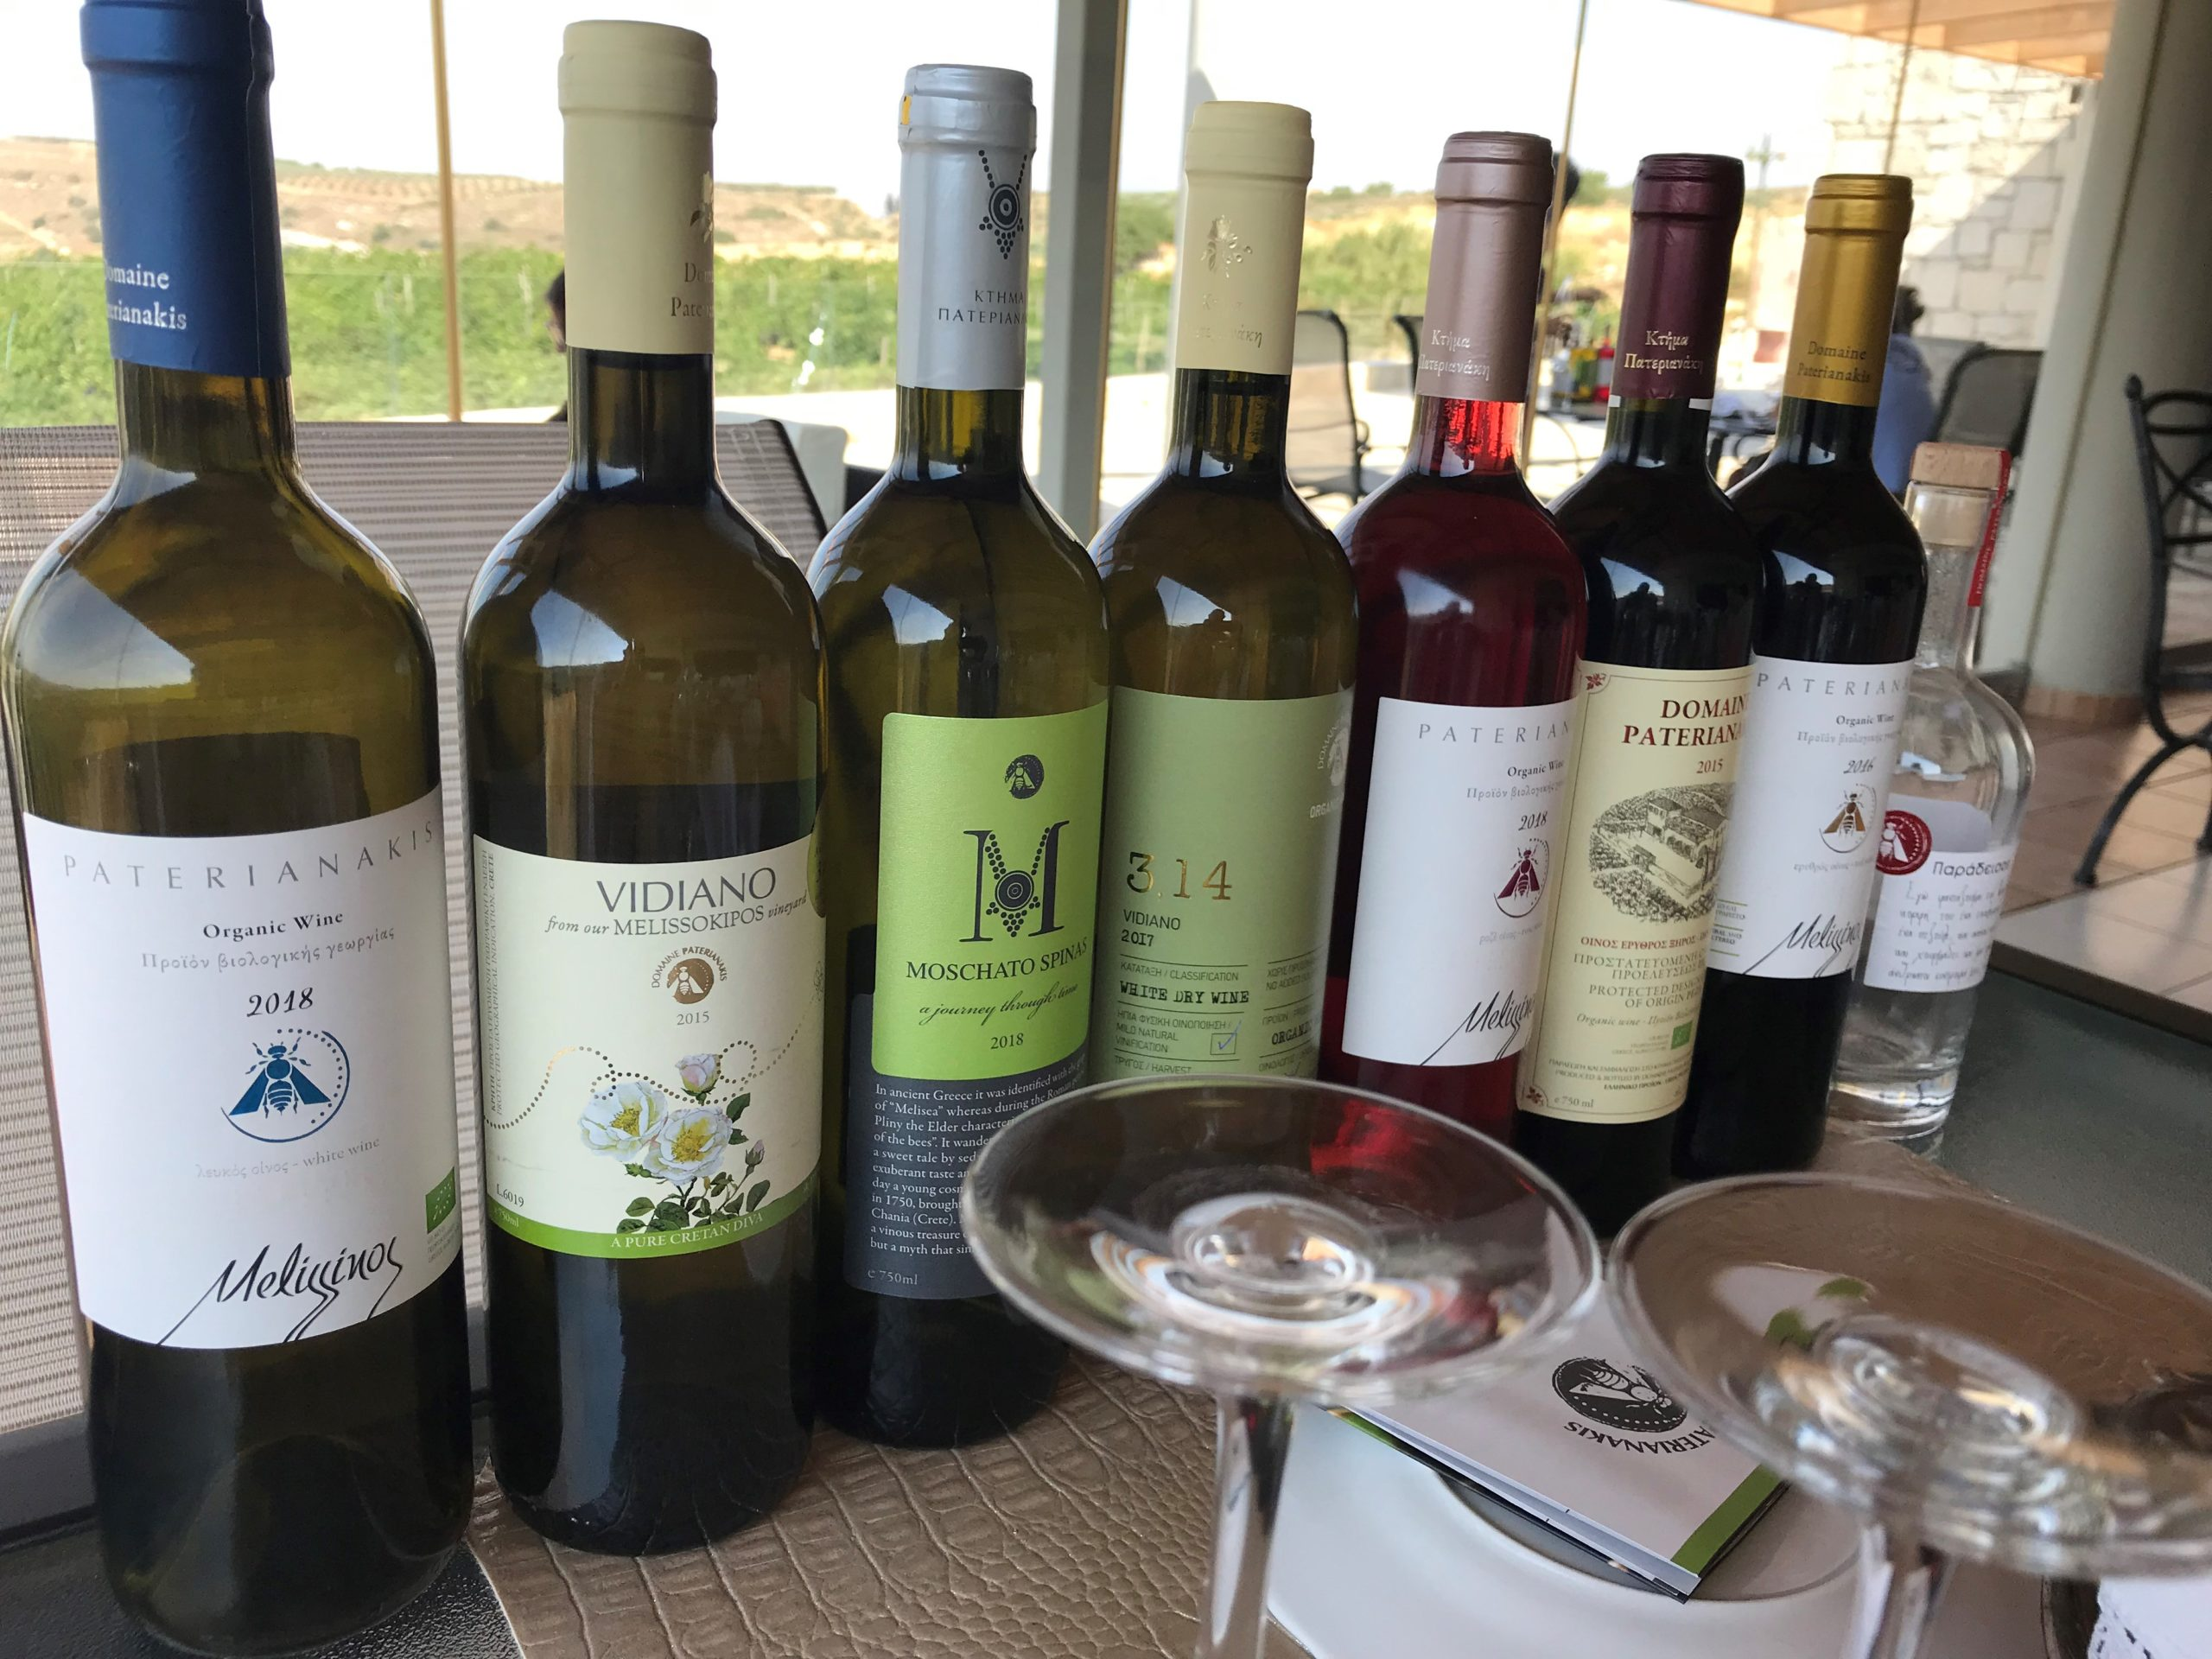 Paterianakis Winery tasting